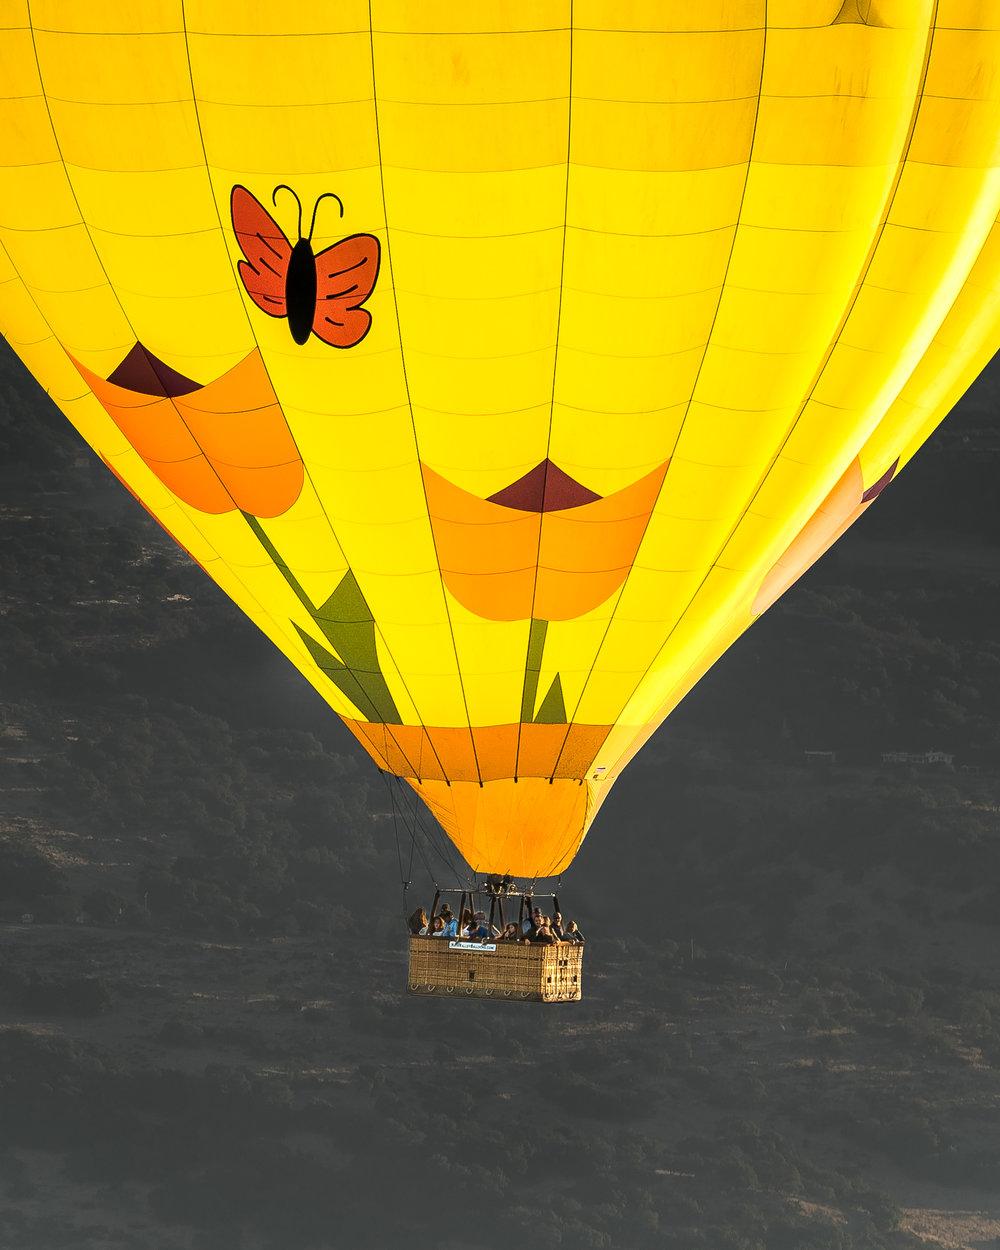 NAPA-Baloon-64.jpg